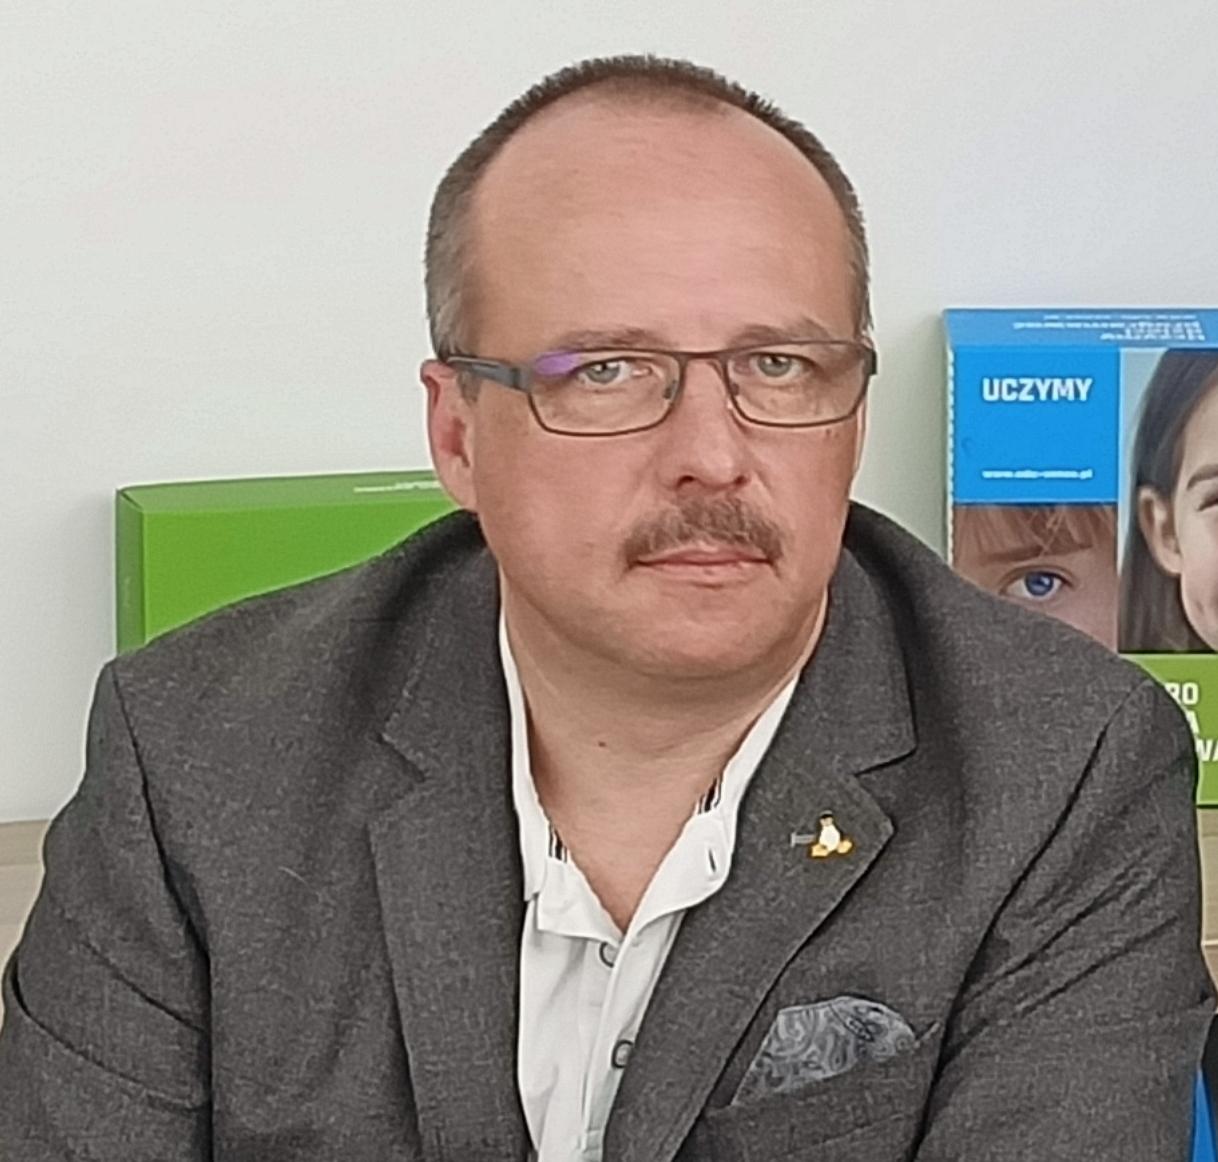 adam_edusense_profil - ABIX Edukacja Adam Jurkiewicz